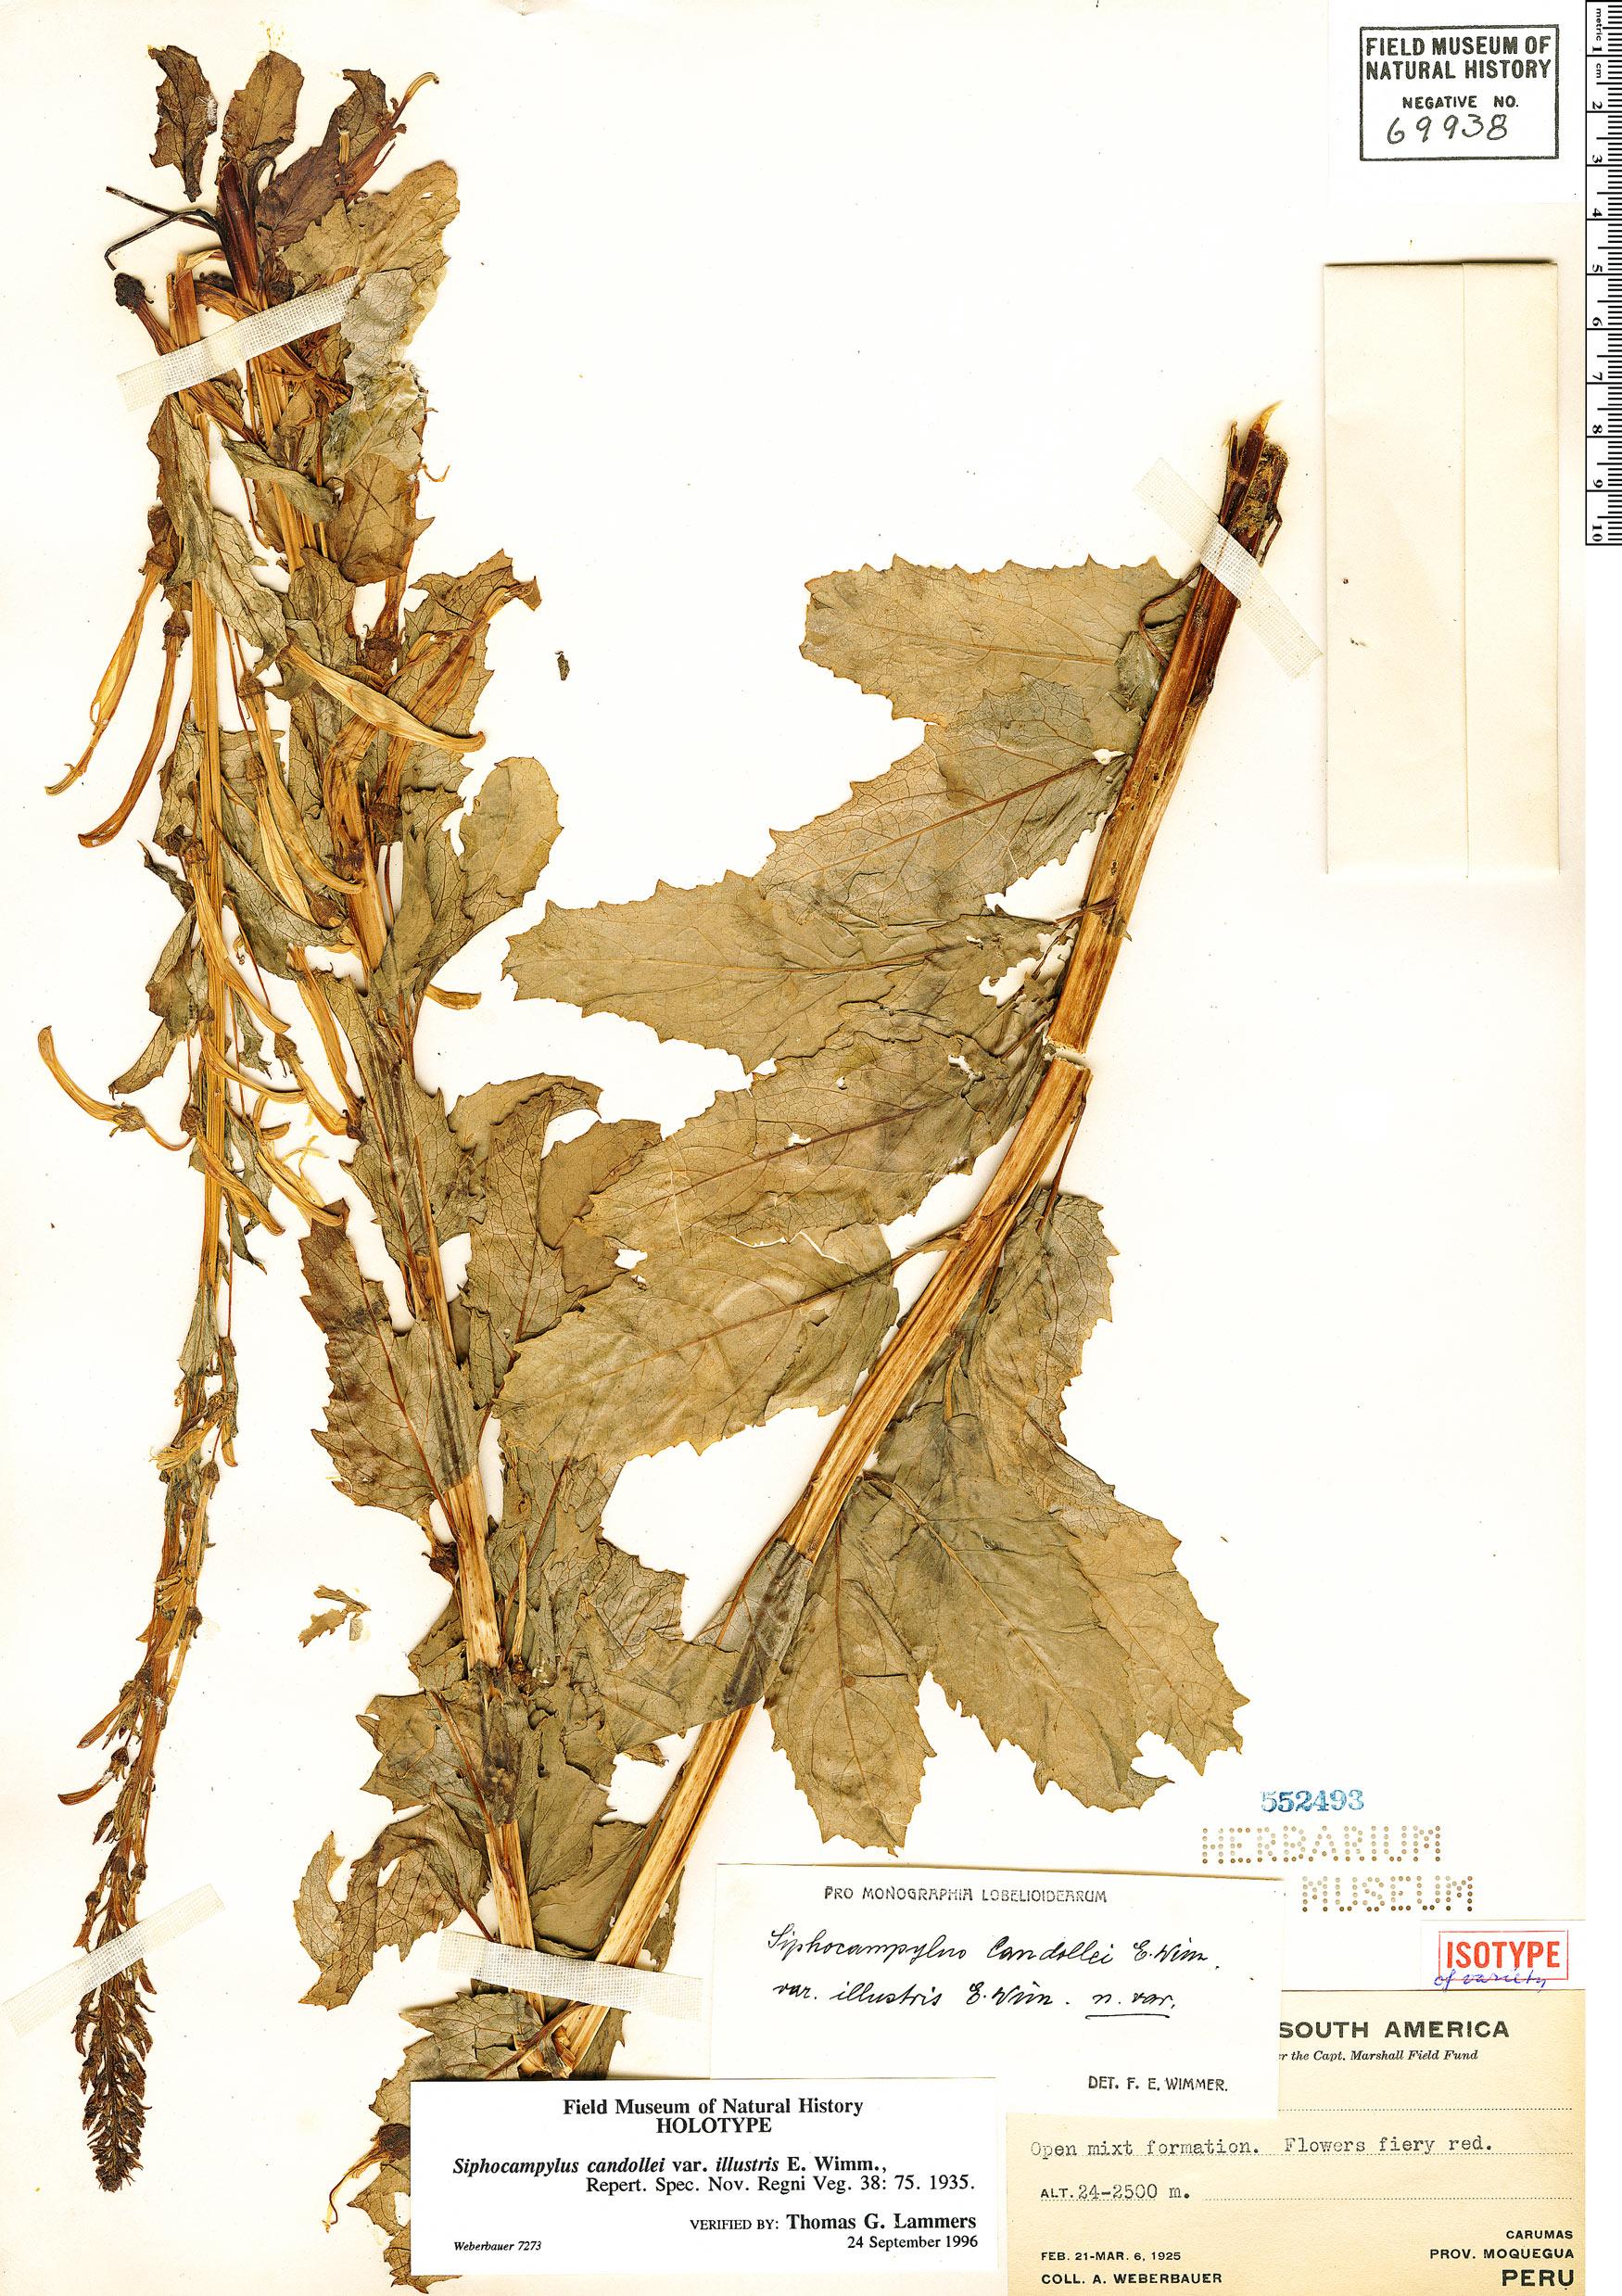 Specimen: Siphocampylus candollei